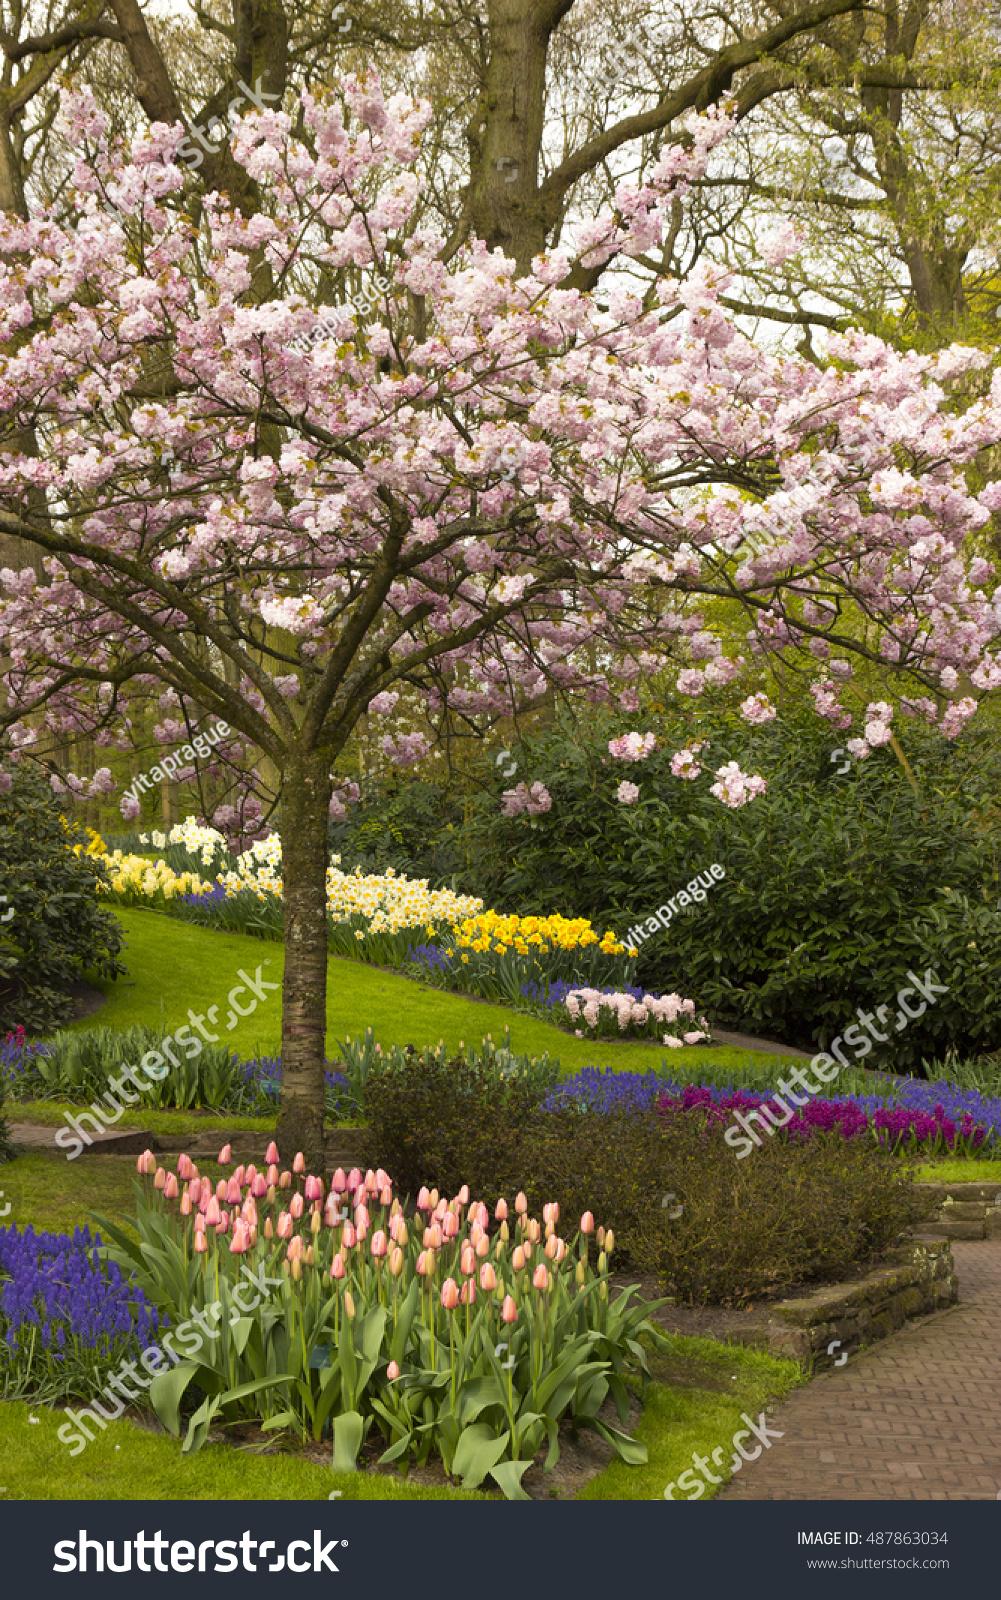 Spring Flowers Keukenhof Garden Netherlands Stock Photo (Royalty ...